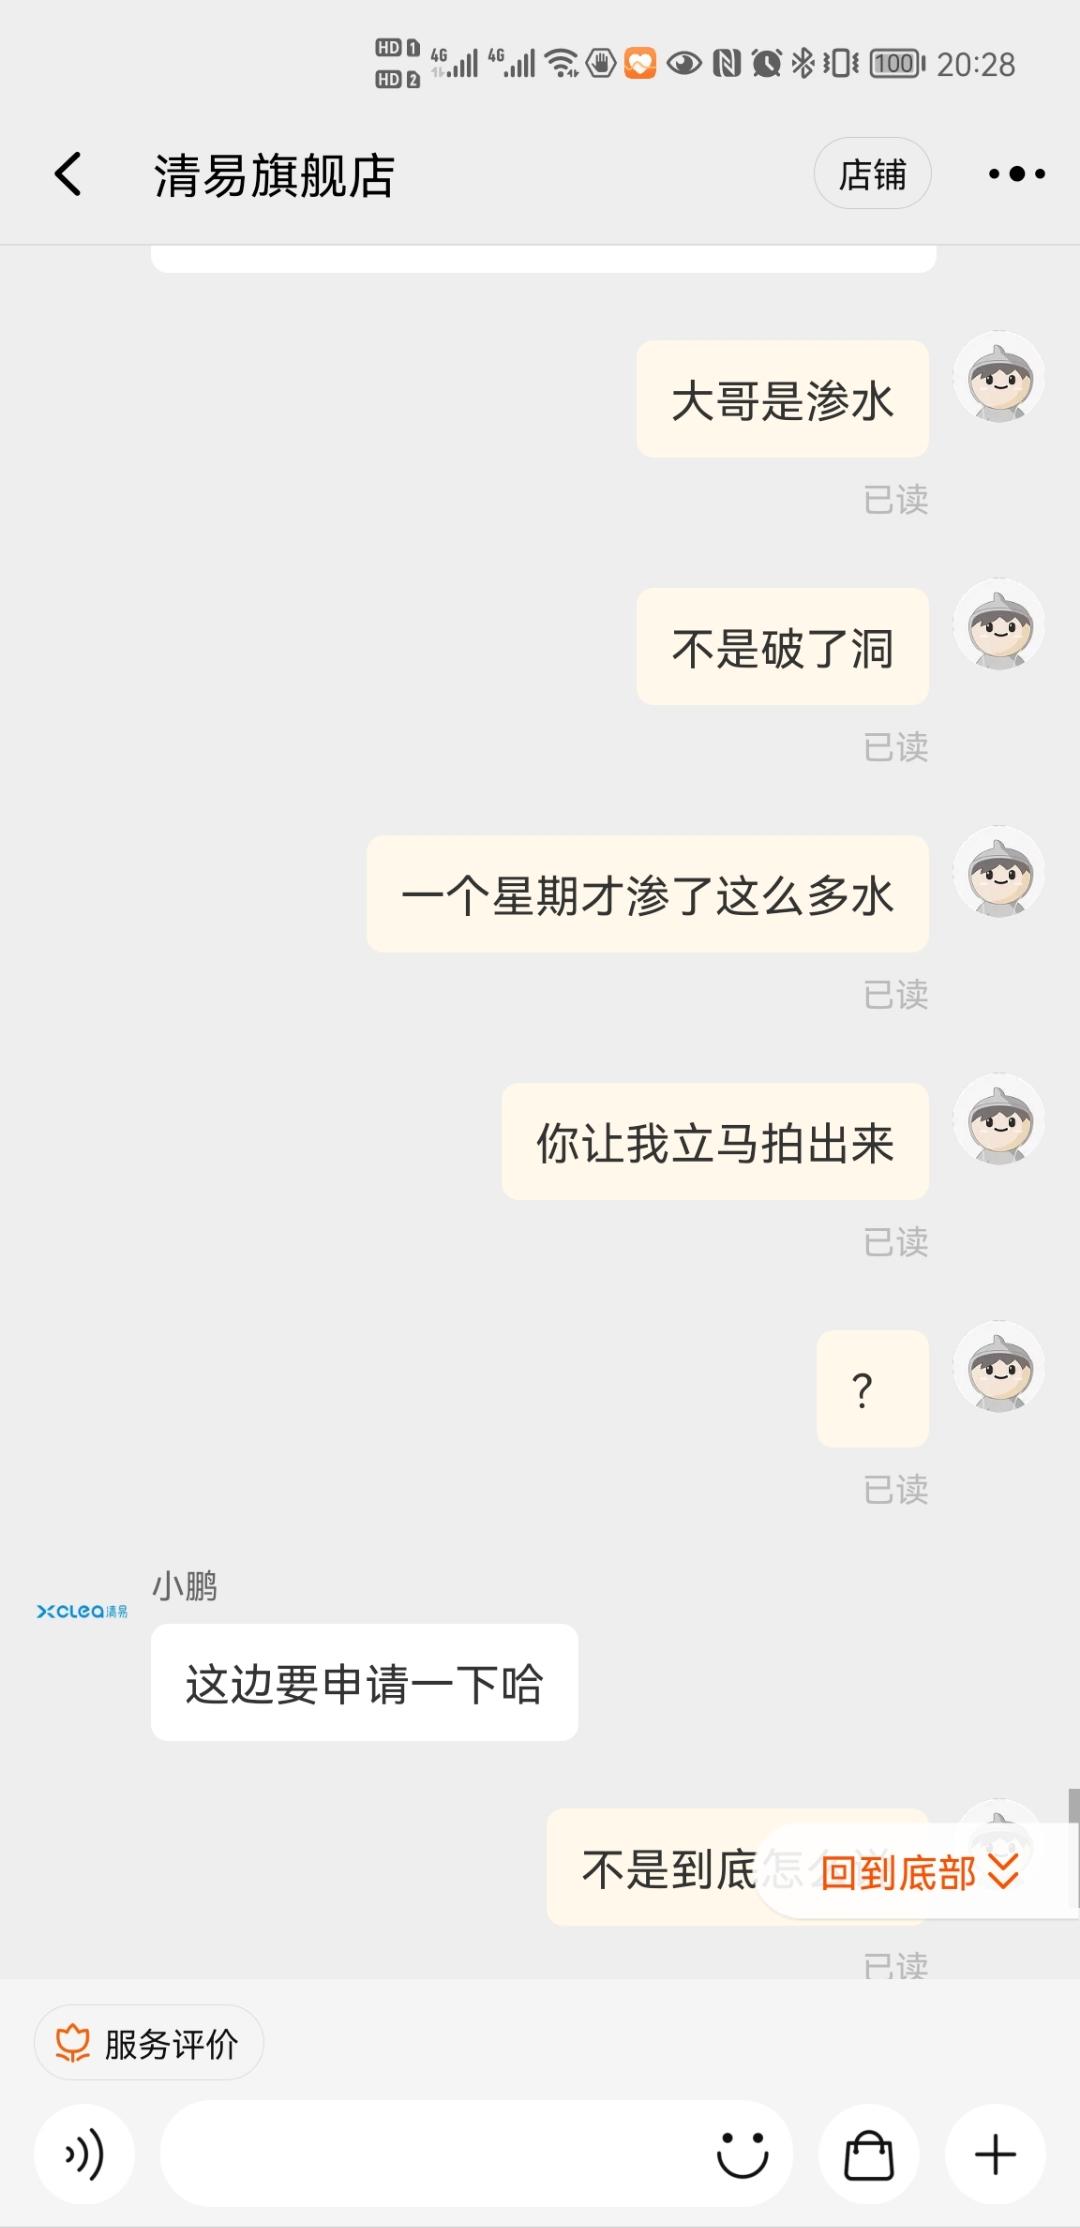 Screenshot_20210903_202803_com.taobao.taobao.jpg